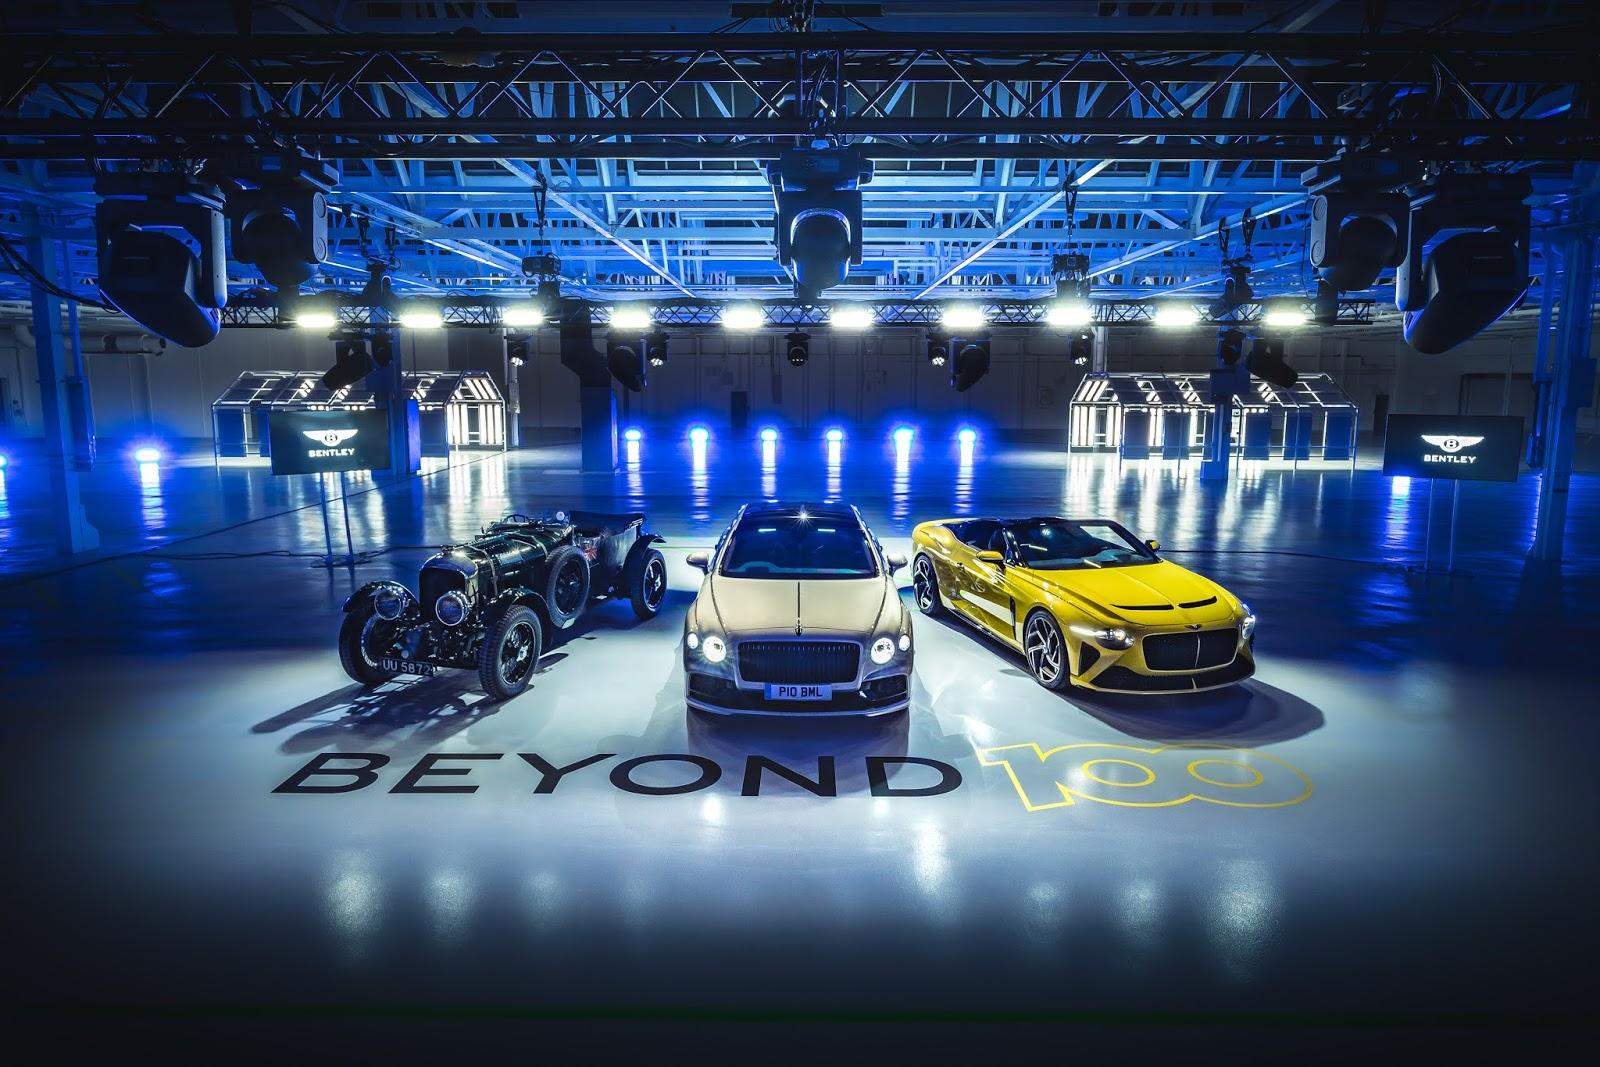 "Beyond1002B 2B1 ""BEYOND100"": Η Στρατηγική Της Bentley Για Τον Επόμενο Αιώνα Της"